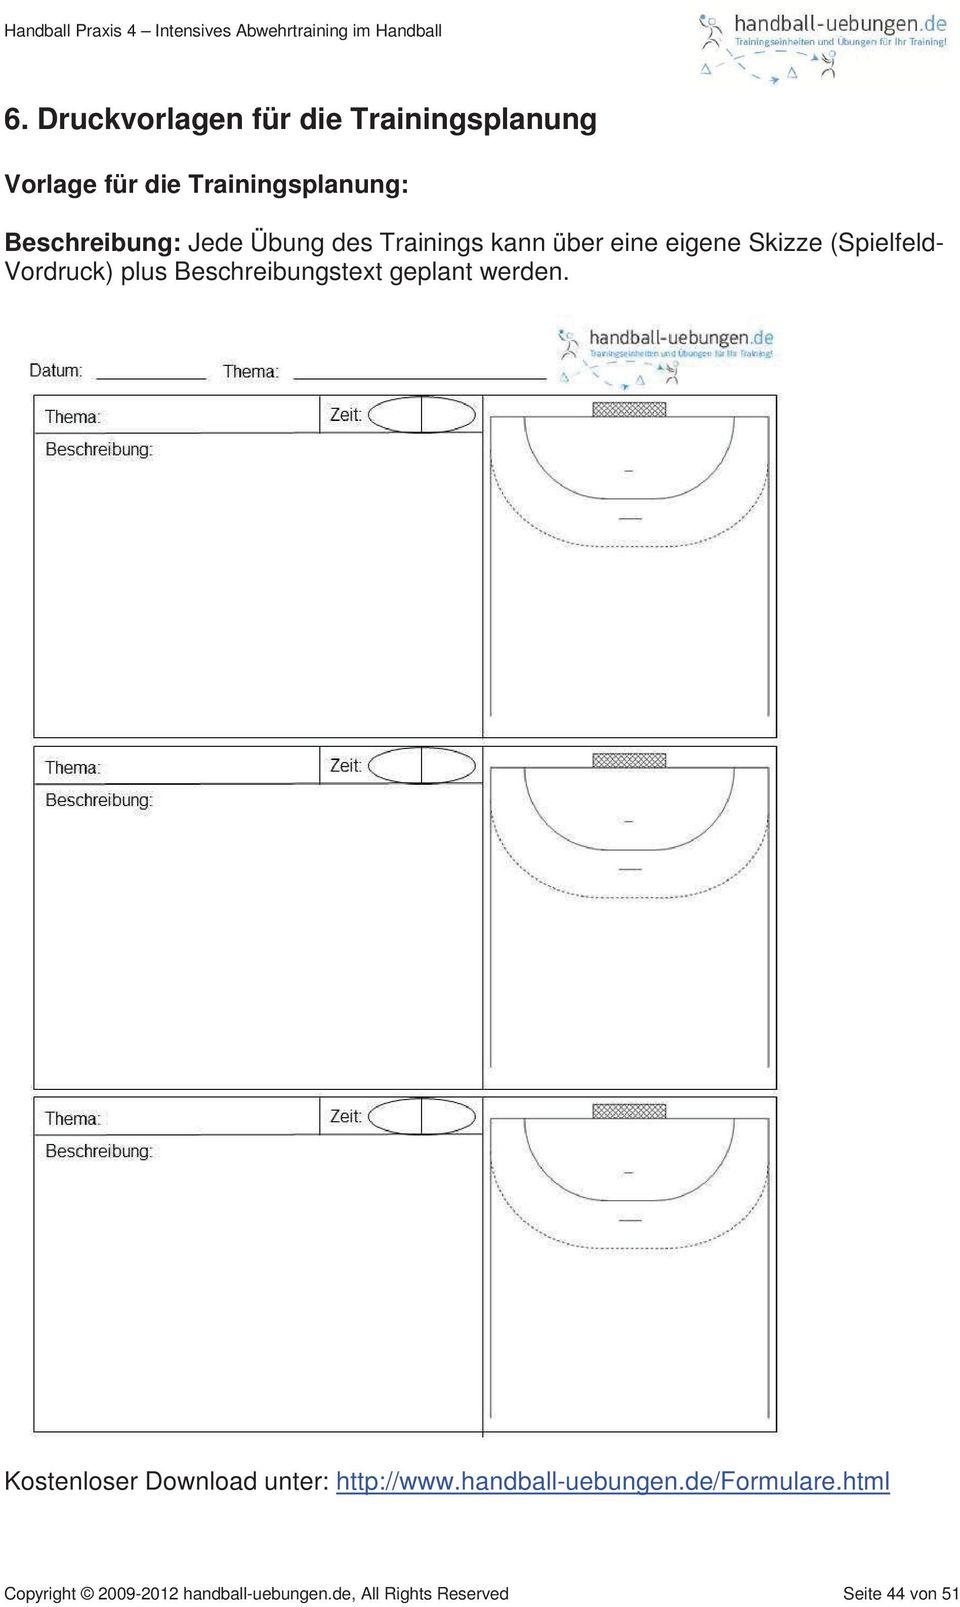 handball praxis 4 komplette